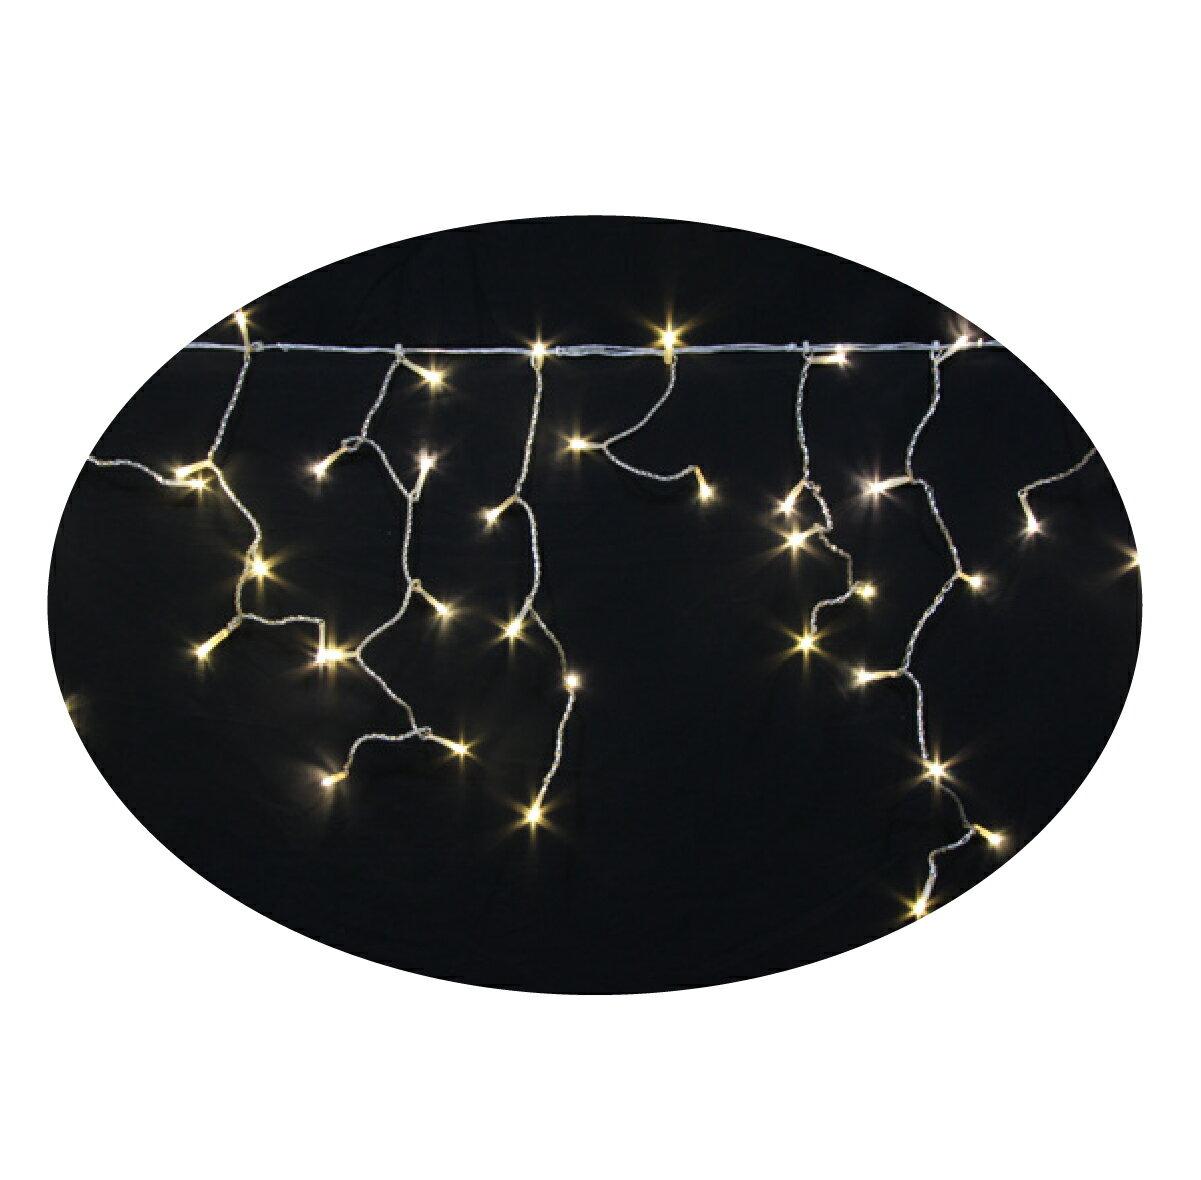 LEDイルミネーションツララ常時点灯V4 140球イエローゴールド高さ:24cm〜72cm幅:351cm